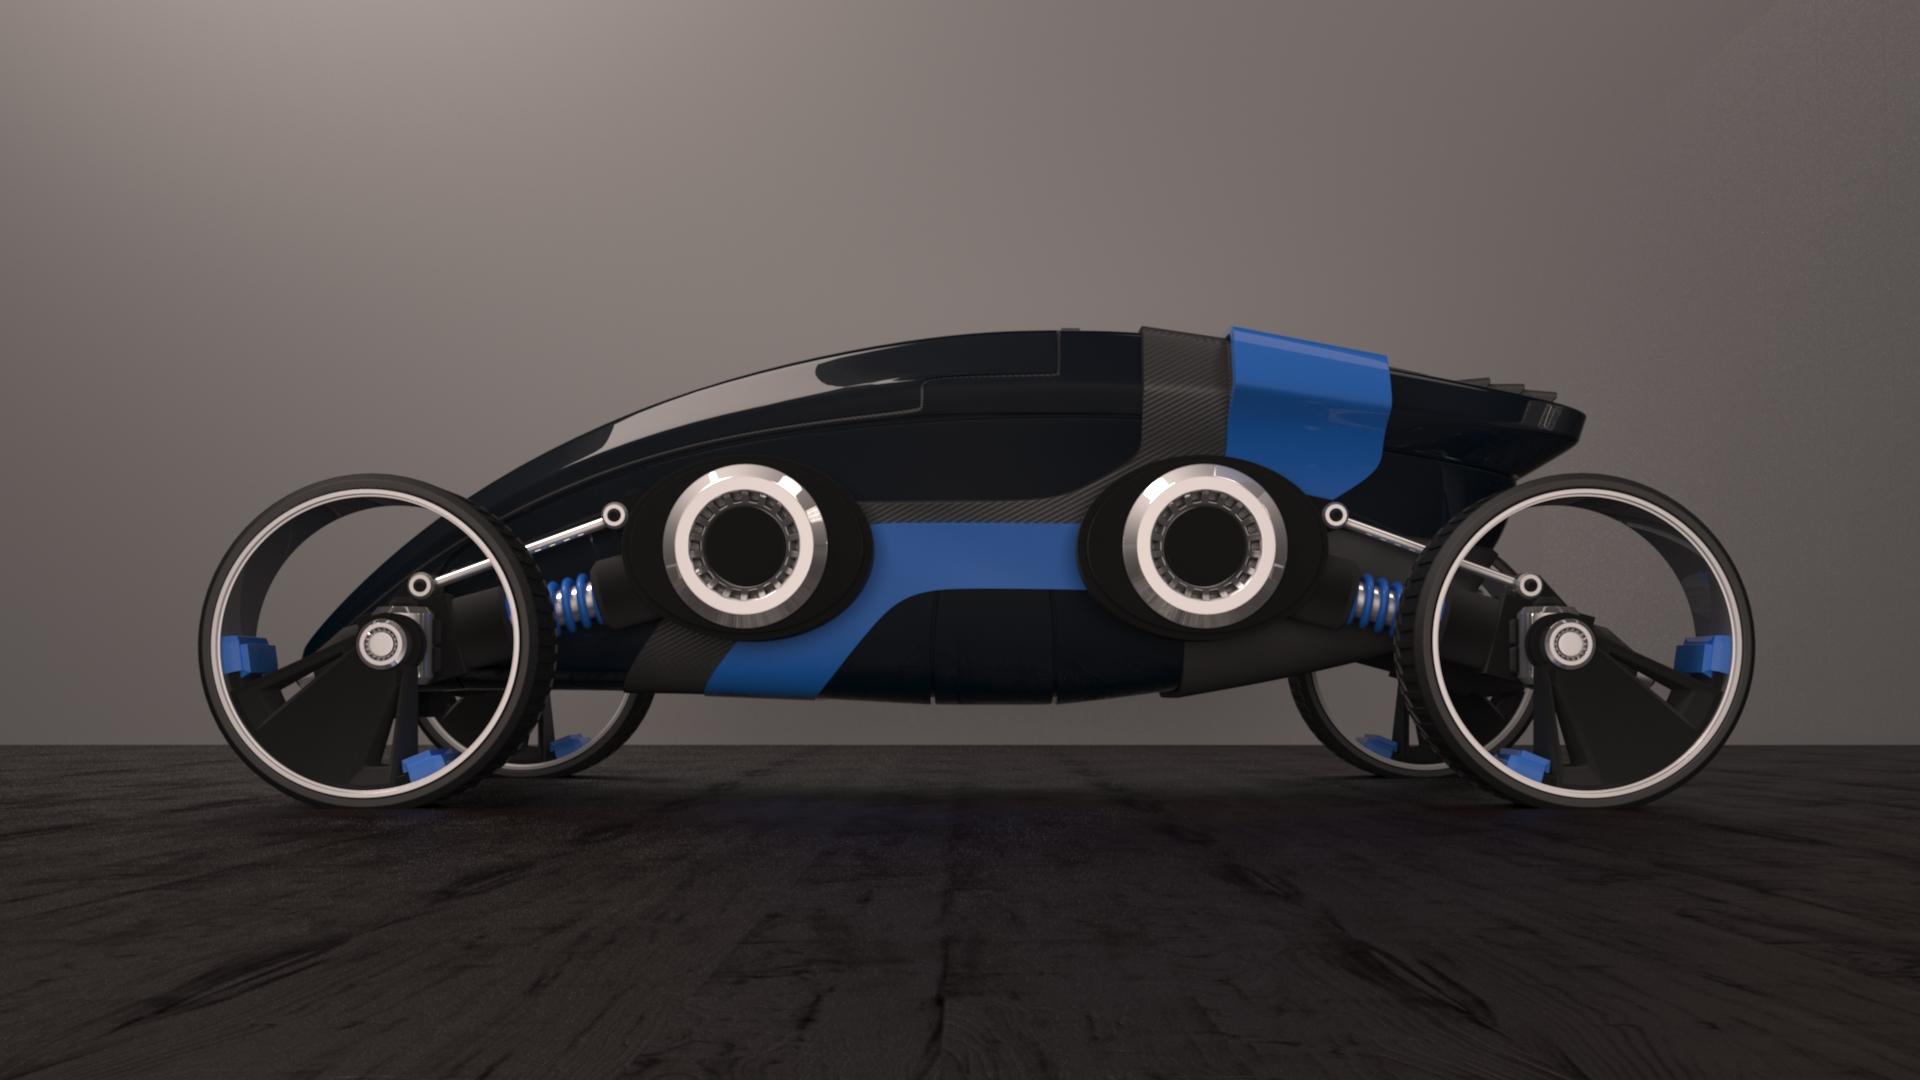 Futuristic car earlier render by curux